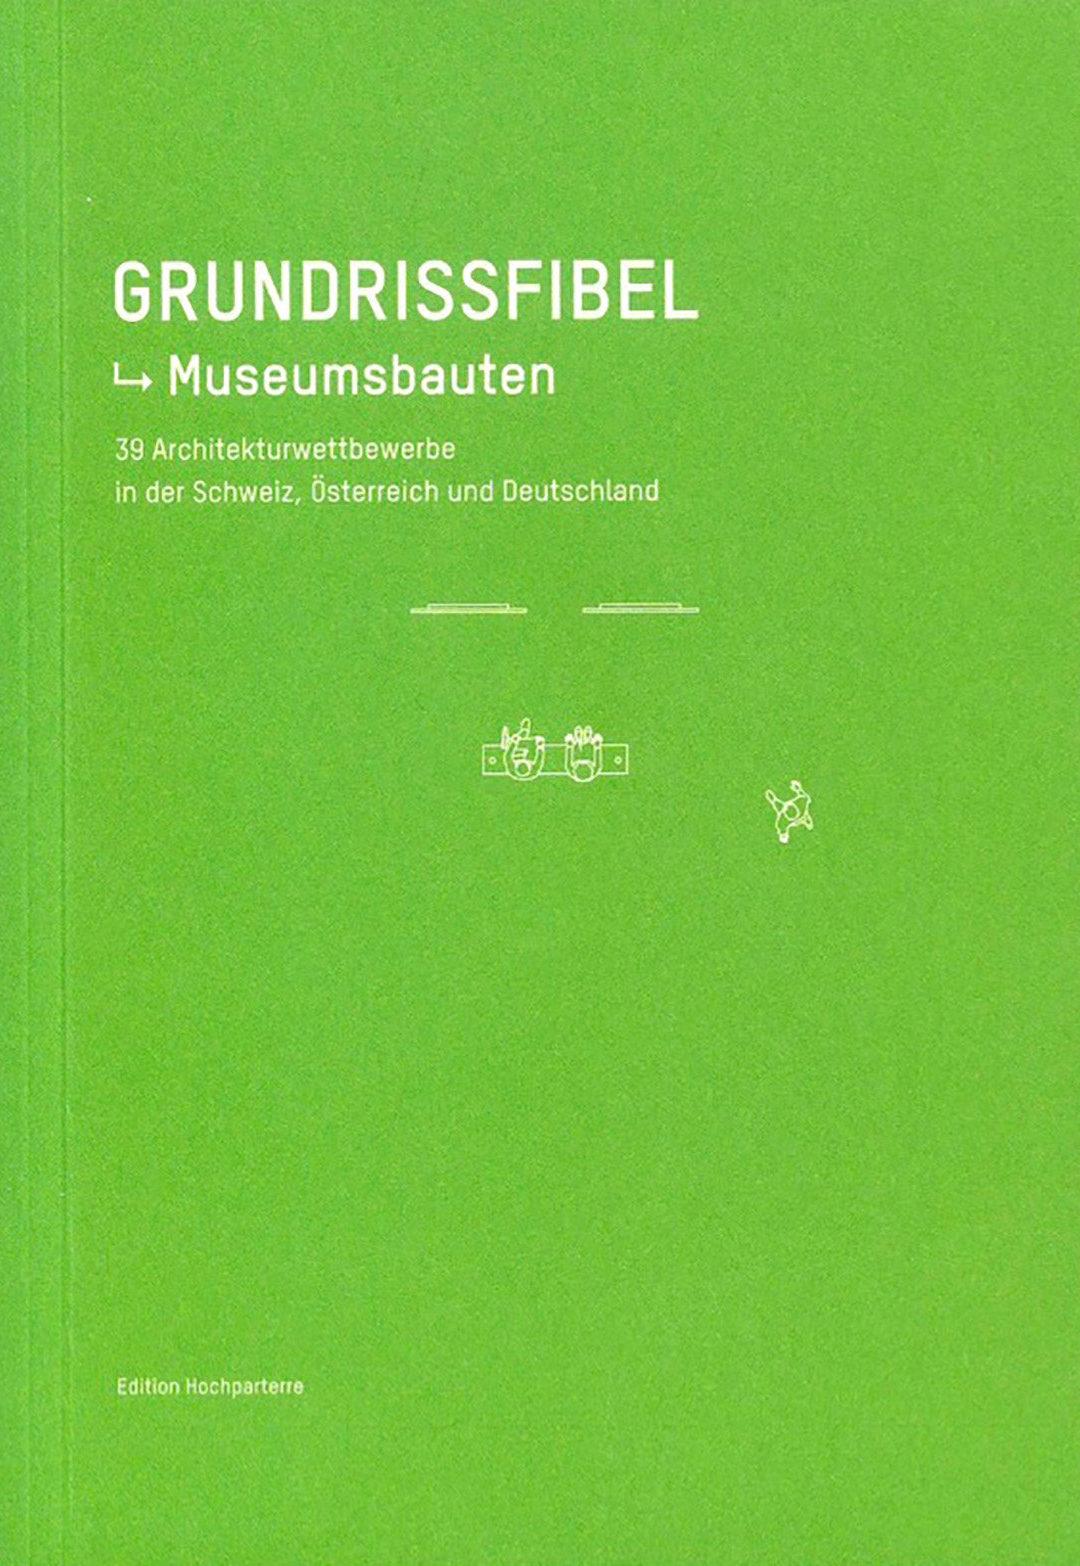 Kunsthalle Mannheim Grundrissfibel 2017